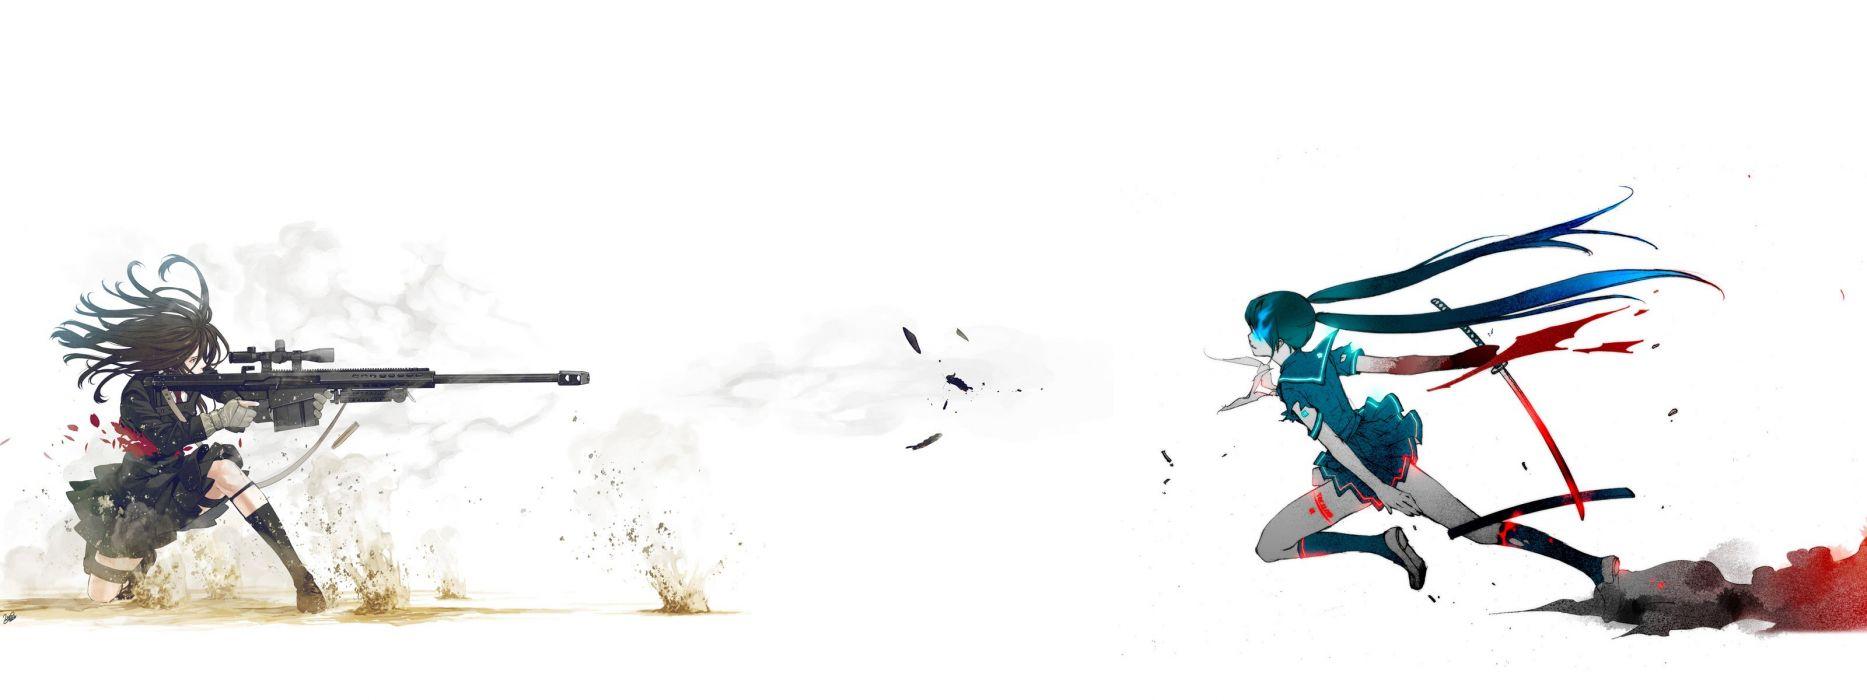 Black Rock Shooter katana long hair blade sniper rifles simple background anime girls wallpaper